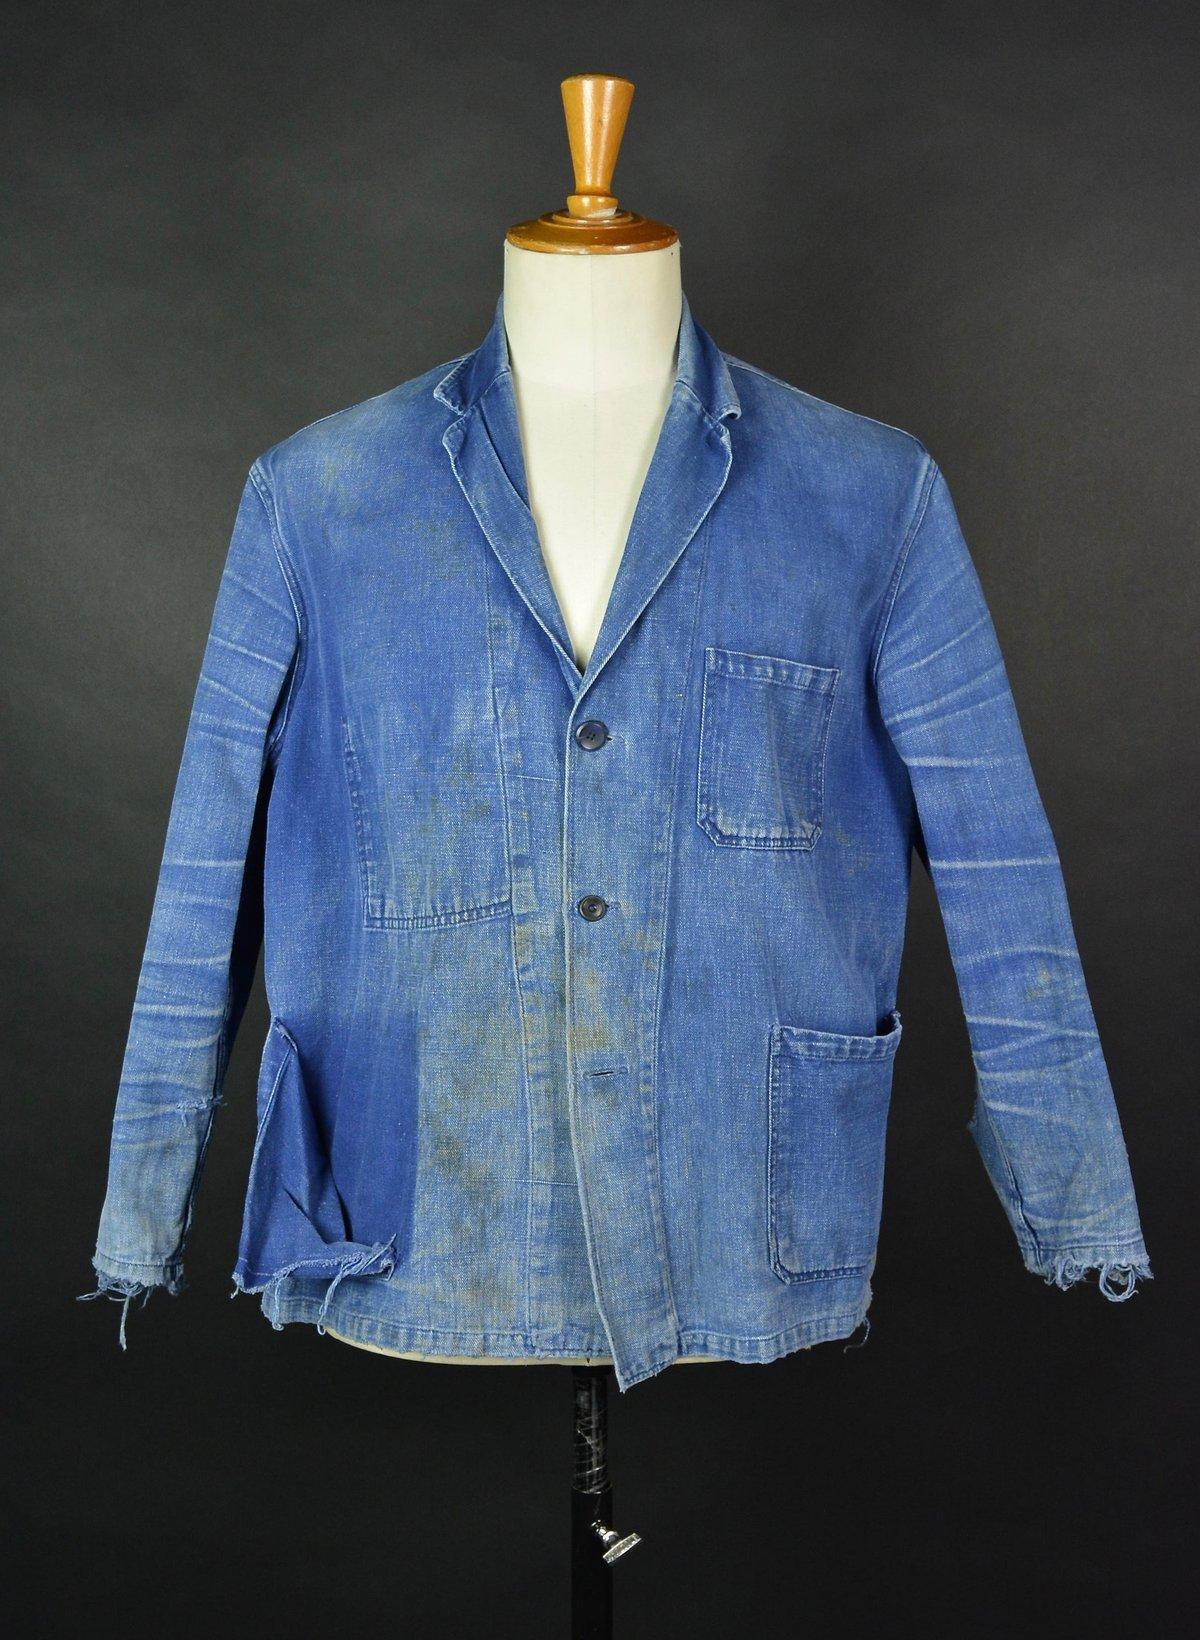 Image of 1940'S AMAZING FADE FRENCH BLUE WORK JACKET DISTESSED 1